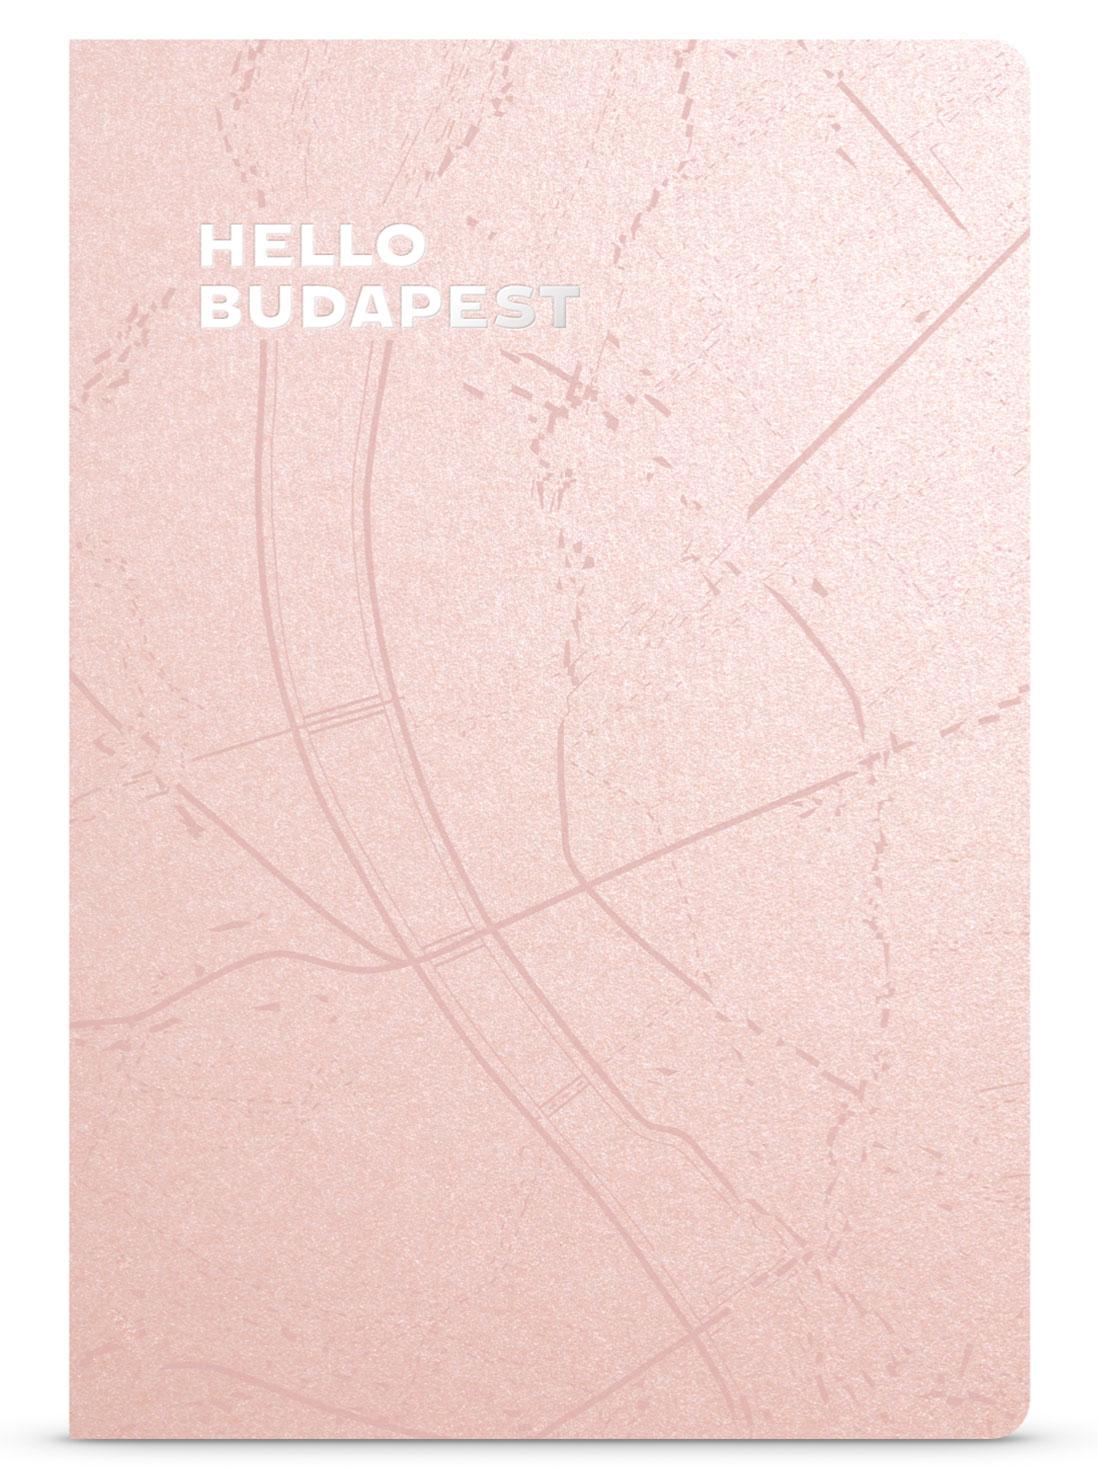 Hello Budapest eco-design notebook Rose Gold details | NOTESS